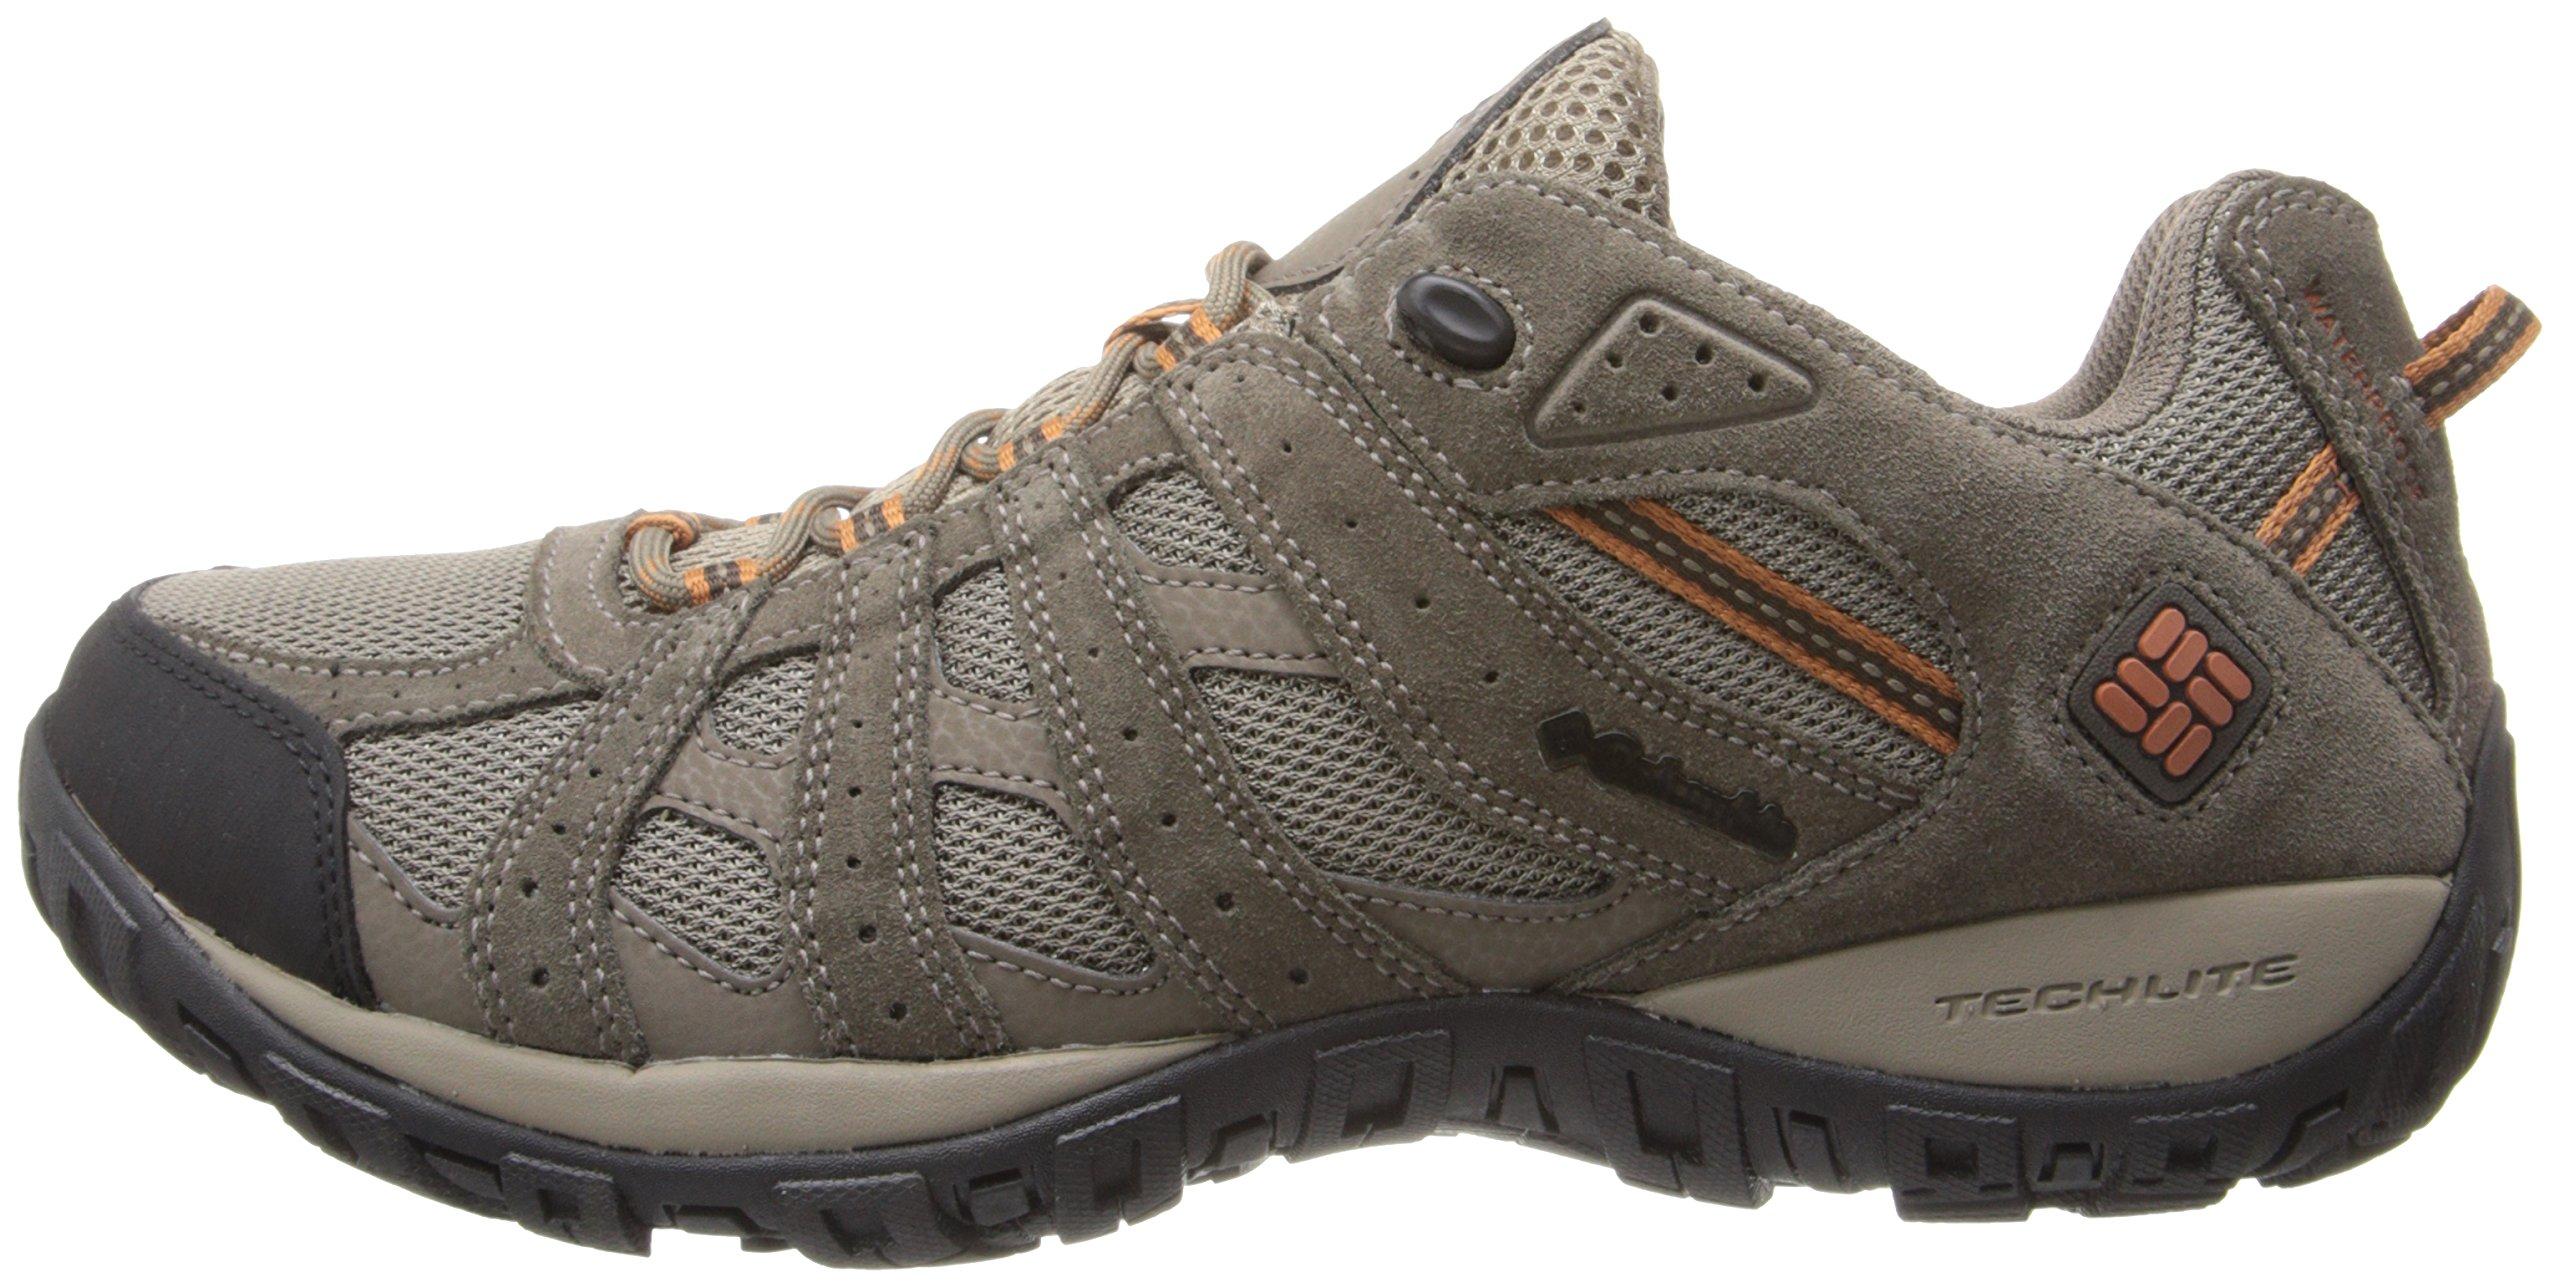 Columbia Men's Redmond Waterproof Hiking Shoe Pebble, Dark Ginger 7 D US by Columbia (Image #5)